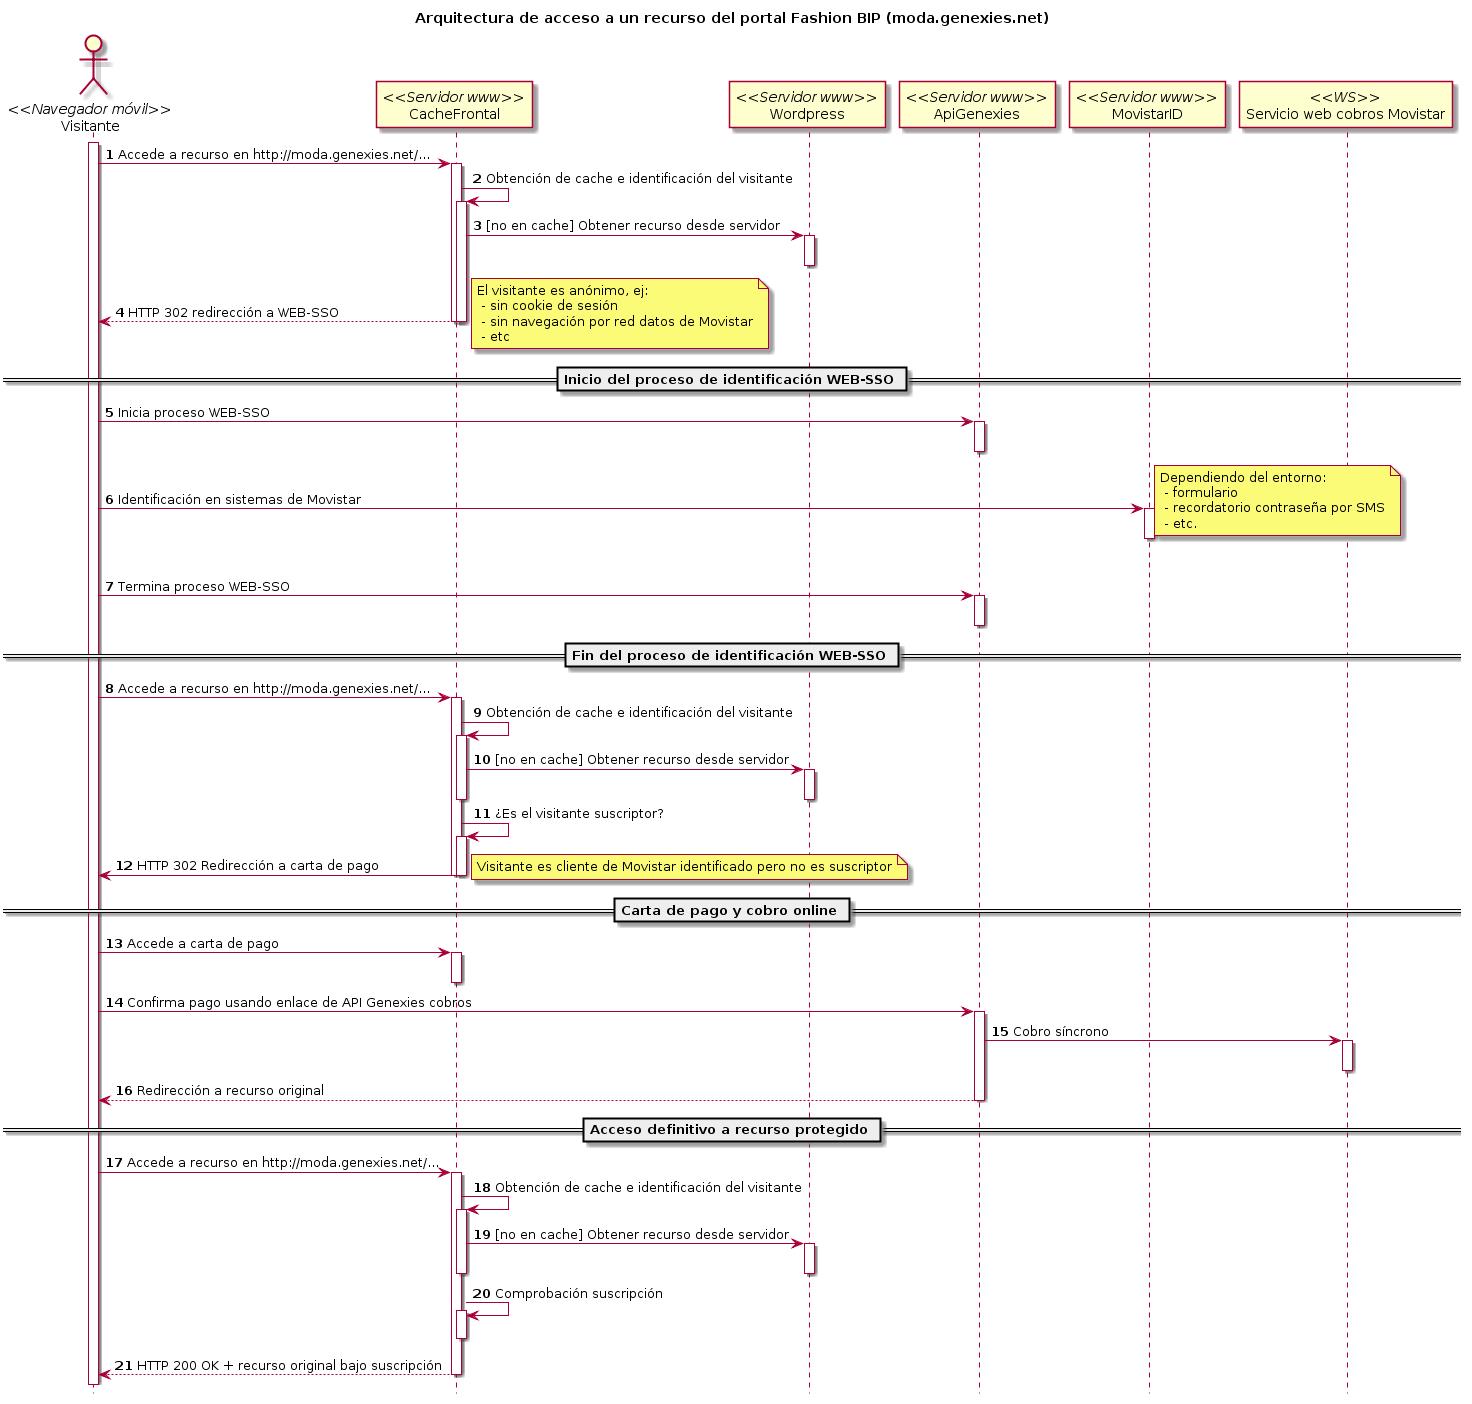 Arquitectura de acceso a un recurso del portal Fashion BIP (moda.genexies.net)